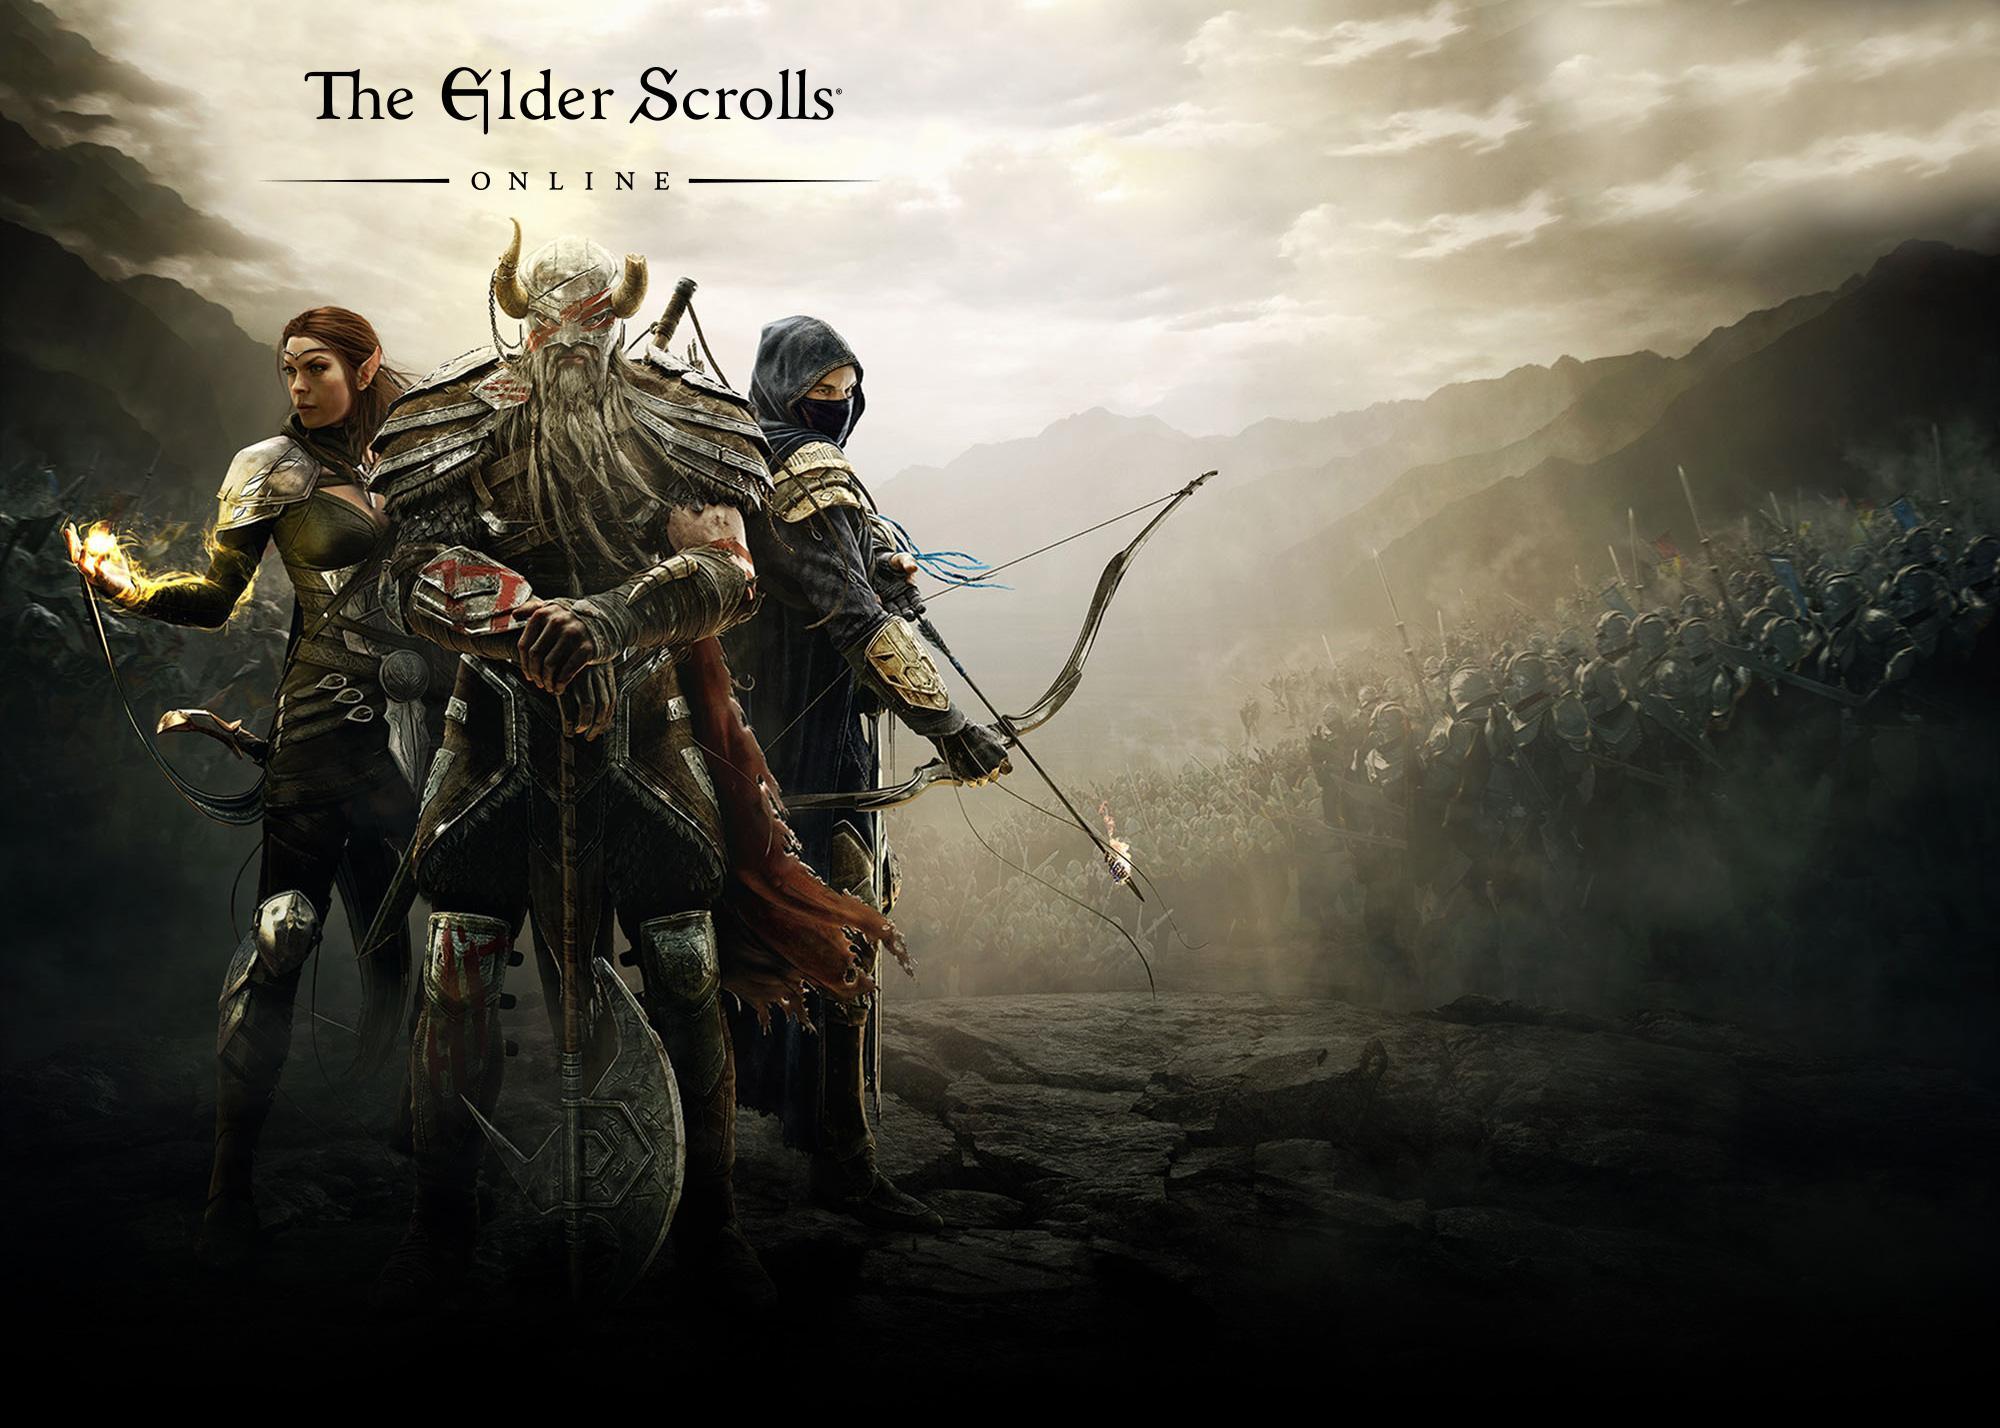 THE ELDER SCROLLS ONLINE -GRATIS- PS4*/XBOX*/PC bis 27.03